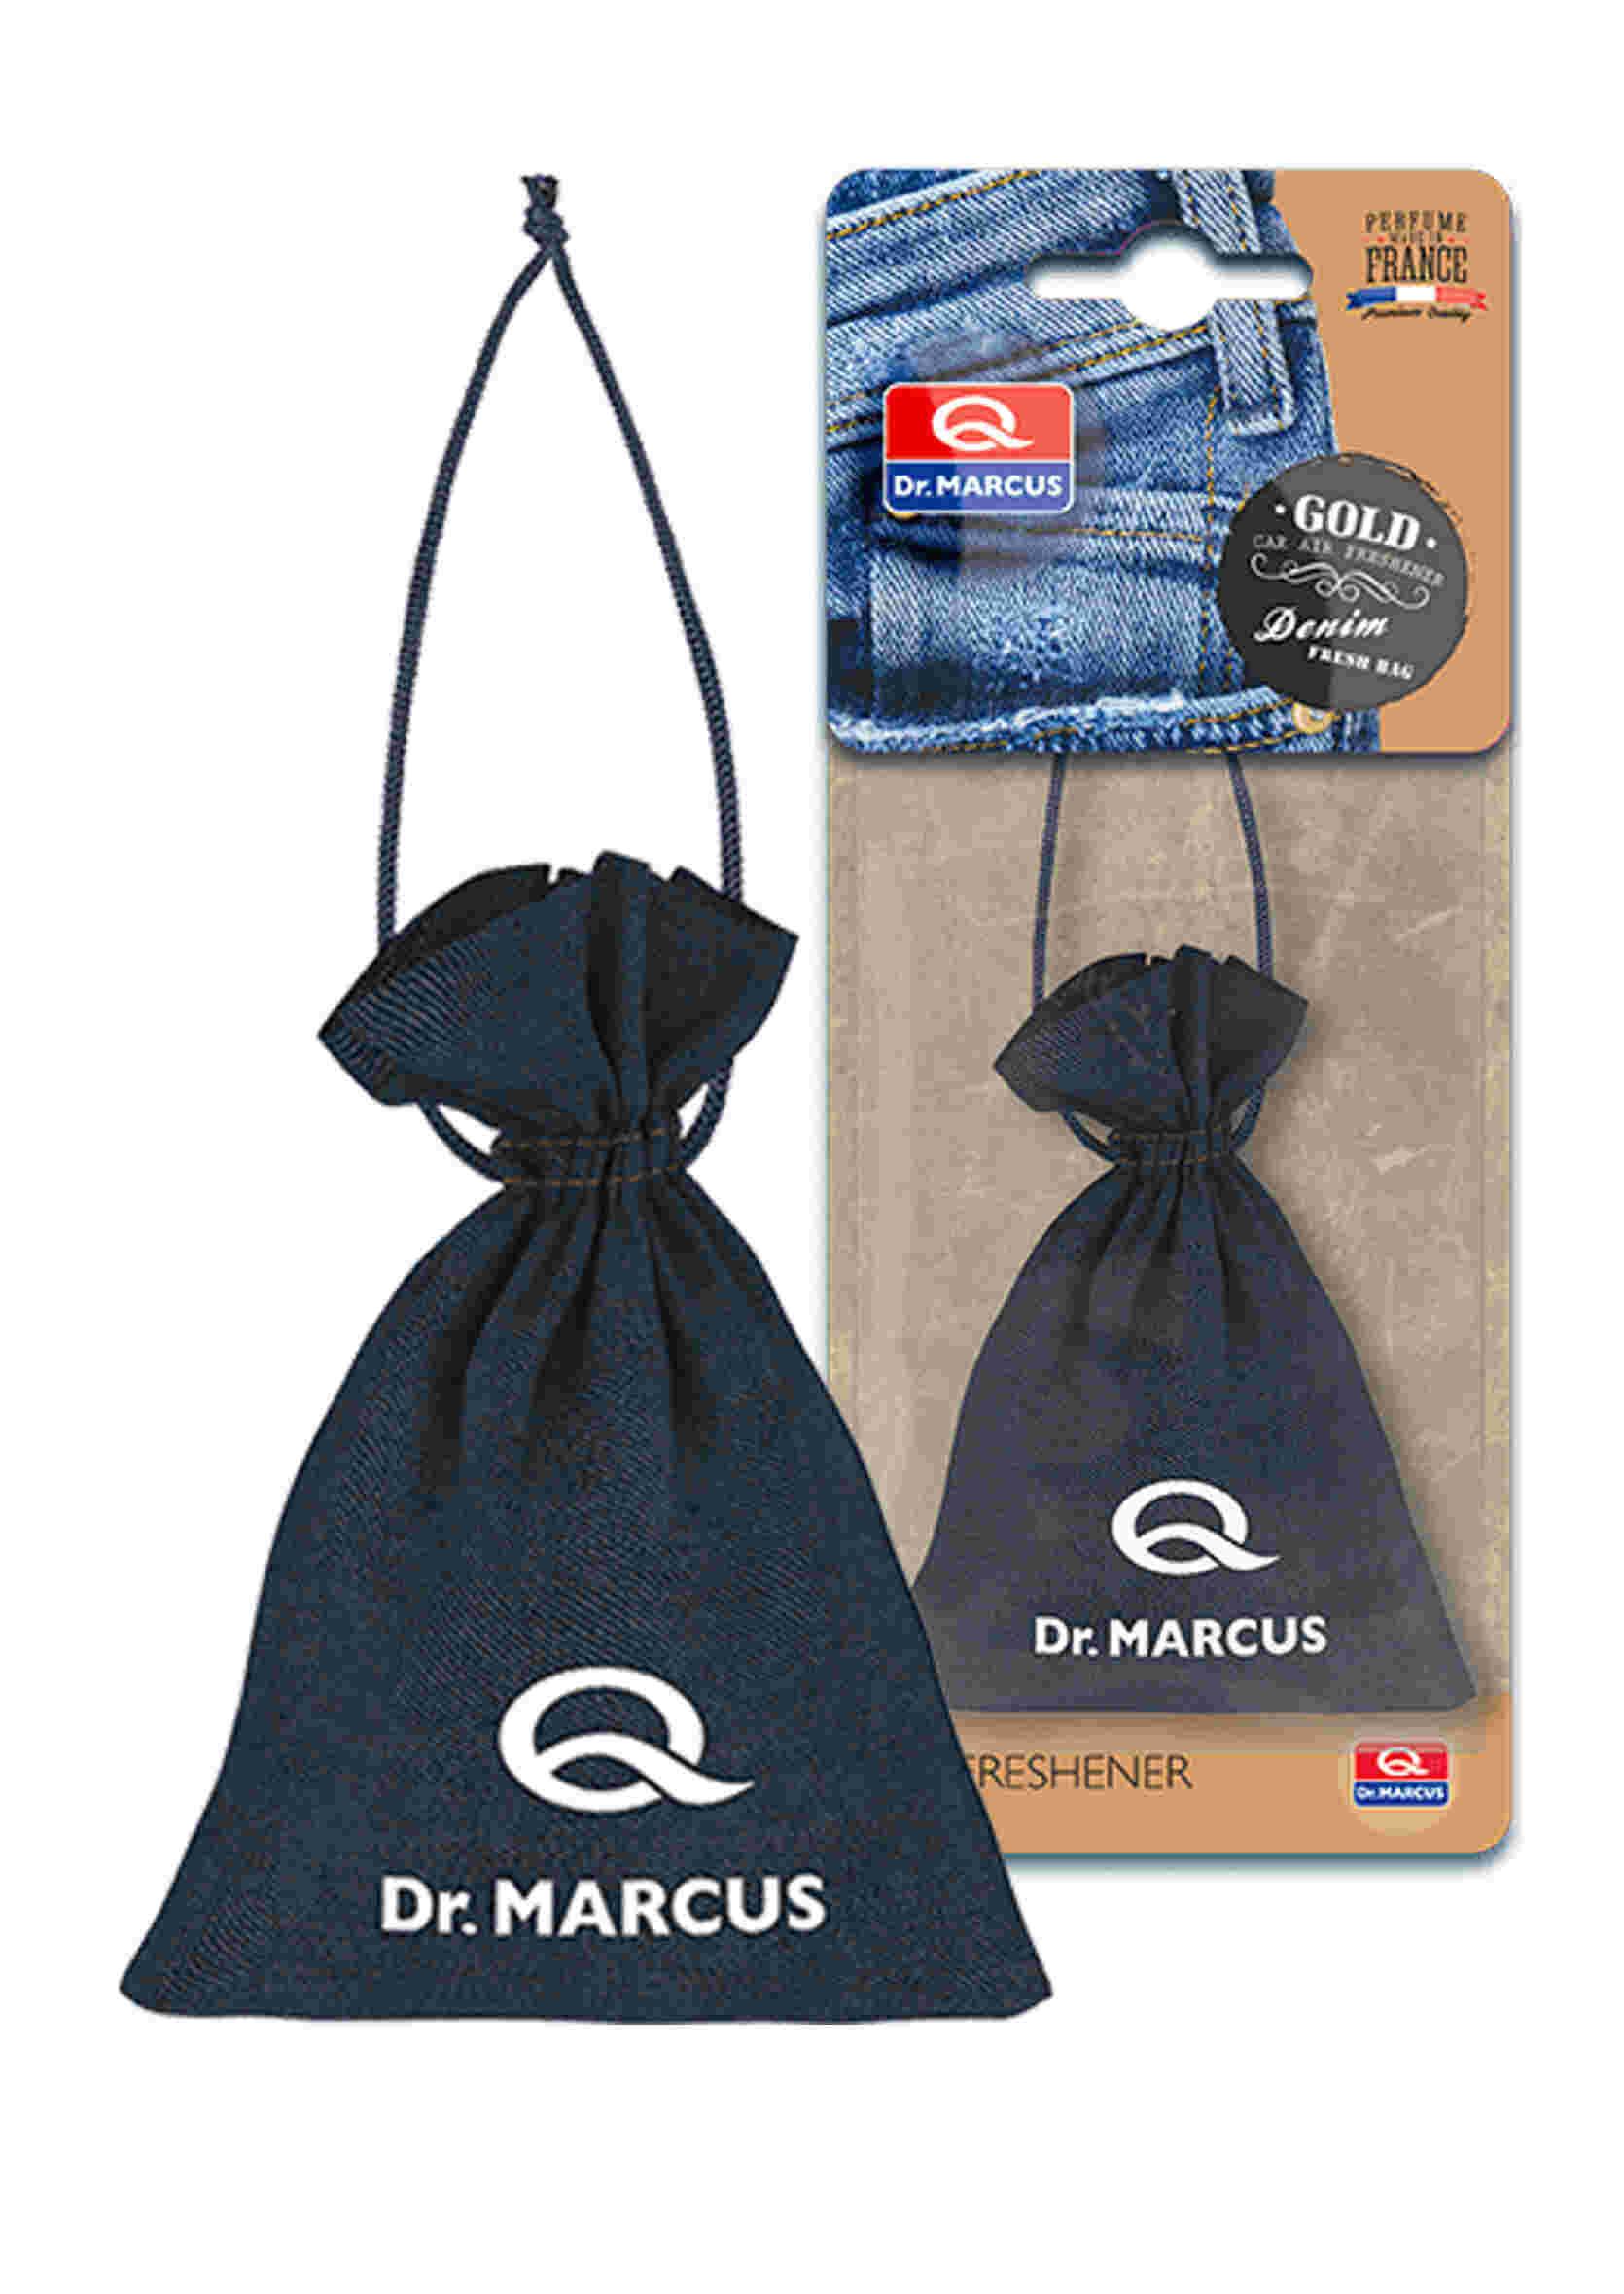 Dr. Marcus Fresh Bag Denim Gold 20g Woreczek Zapachowy Perfumowany